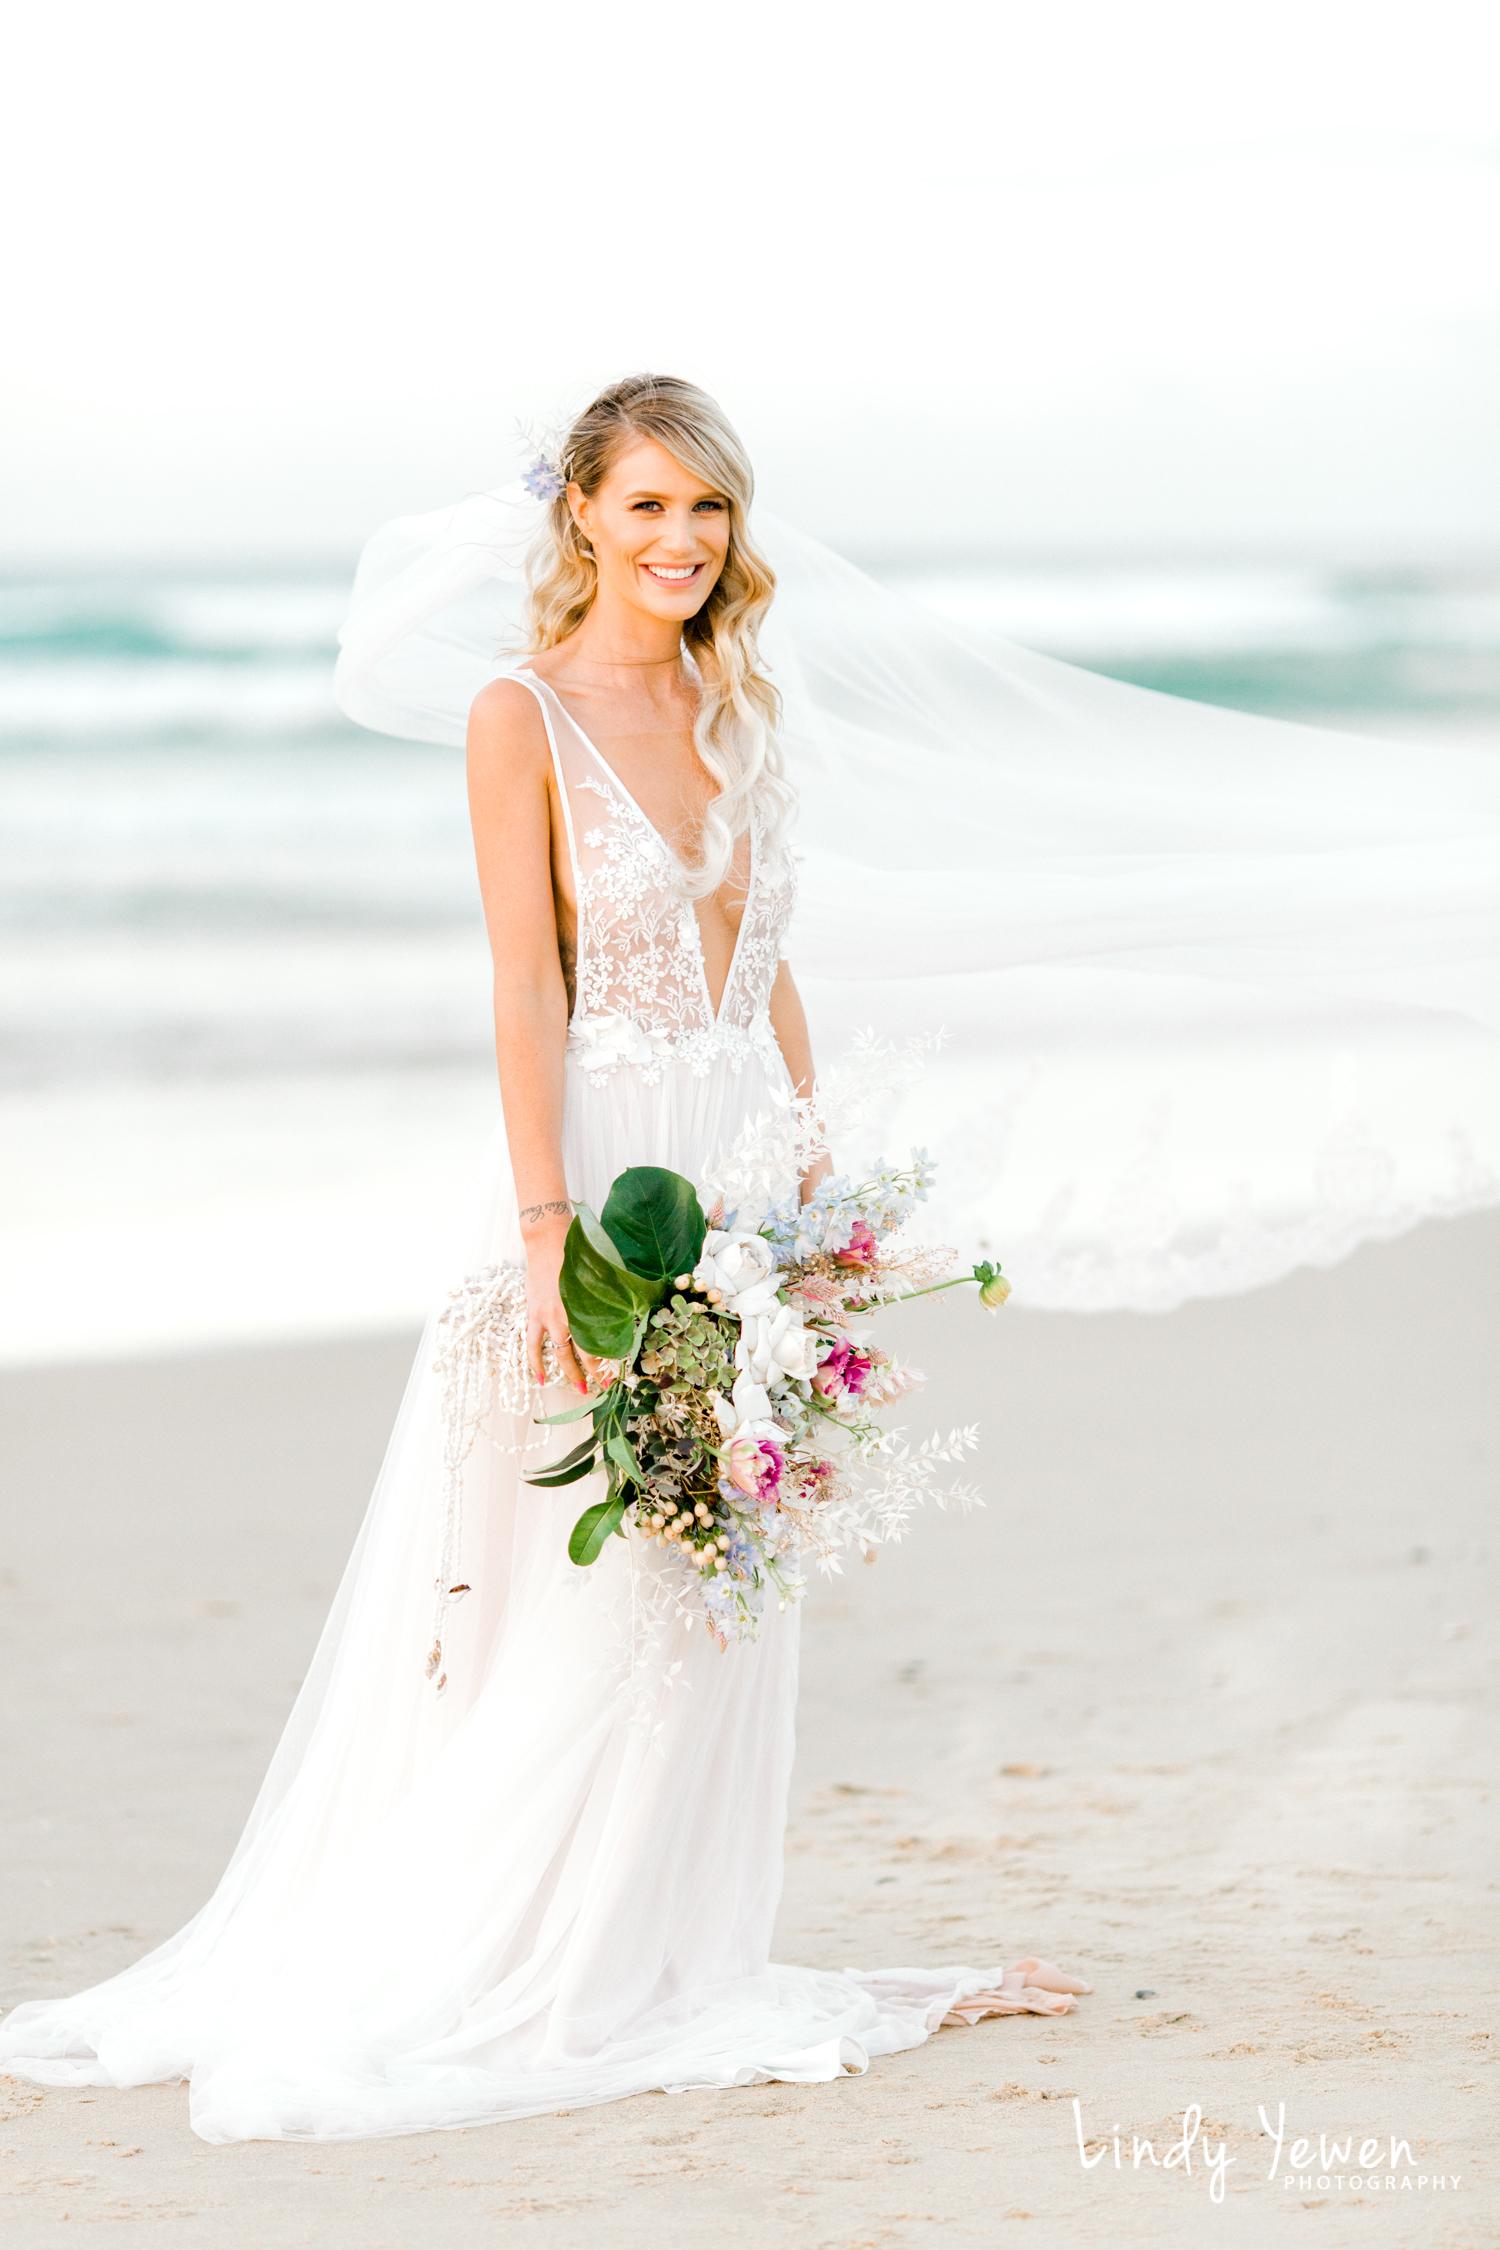 Lindy-Photography-Noosa-Weddings-Grace-Chris 1000.jpg